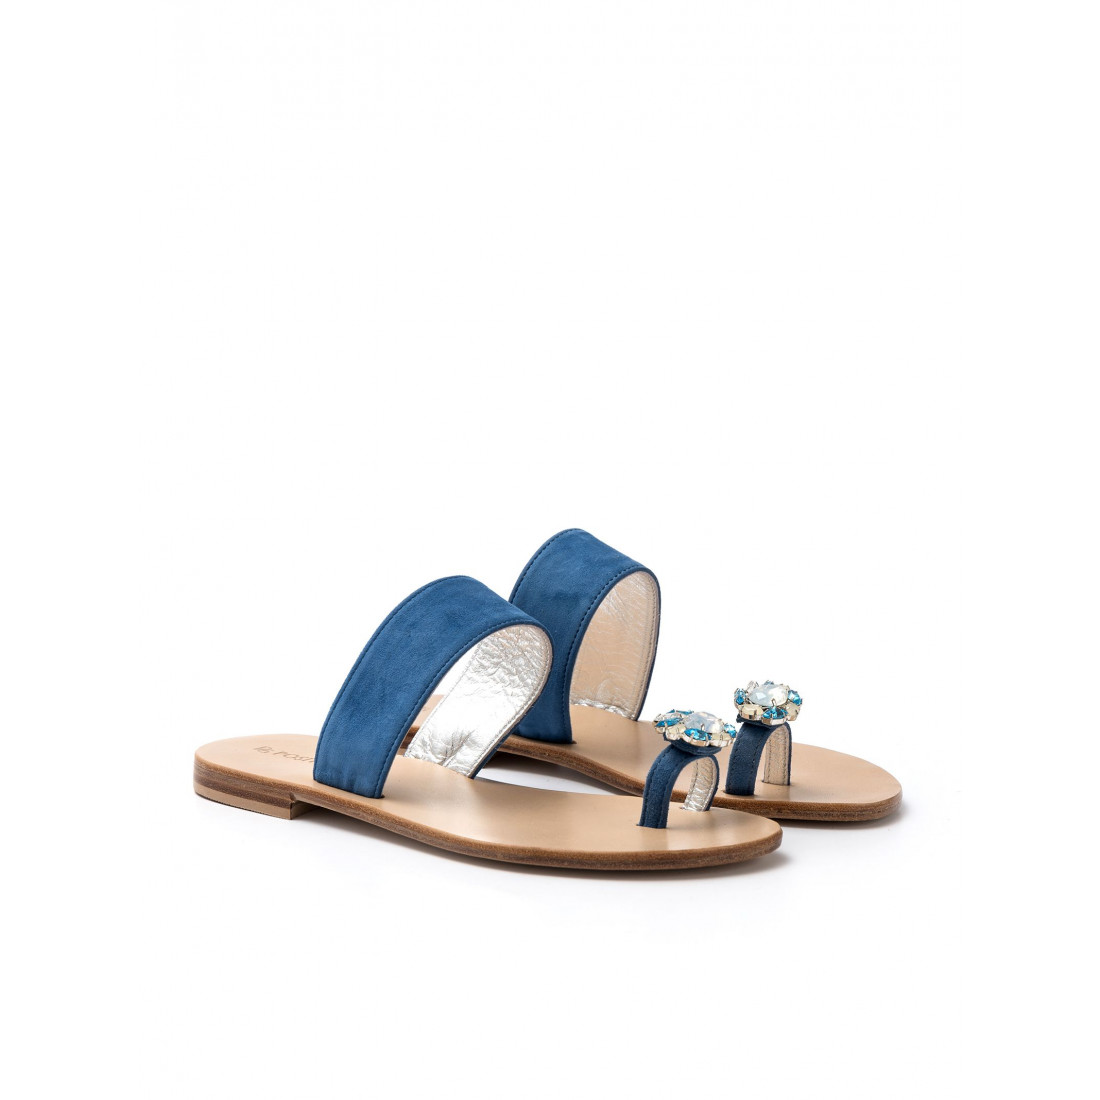 sandals woman positano 4807 camoscio avion 538